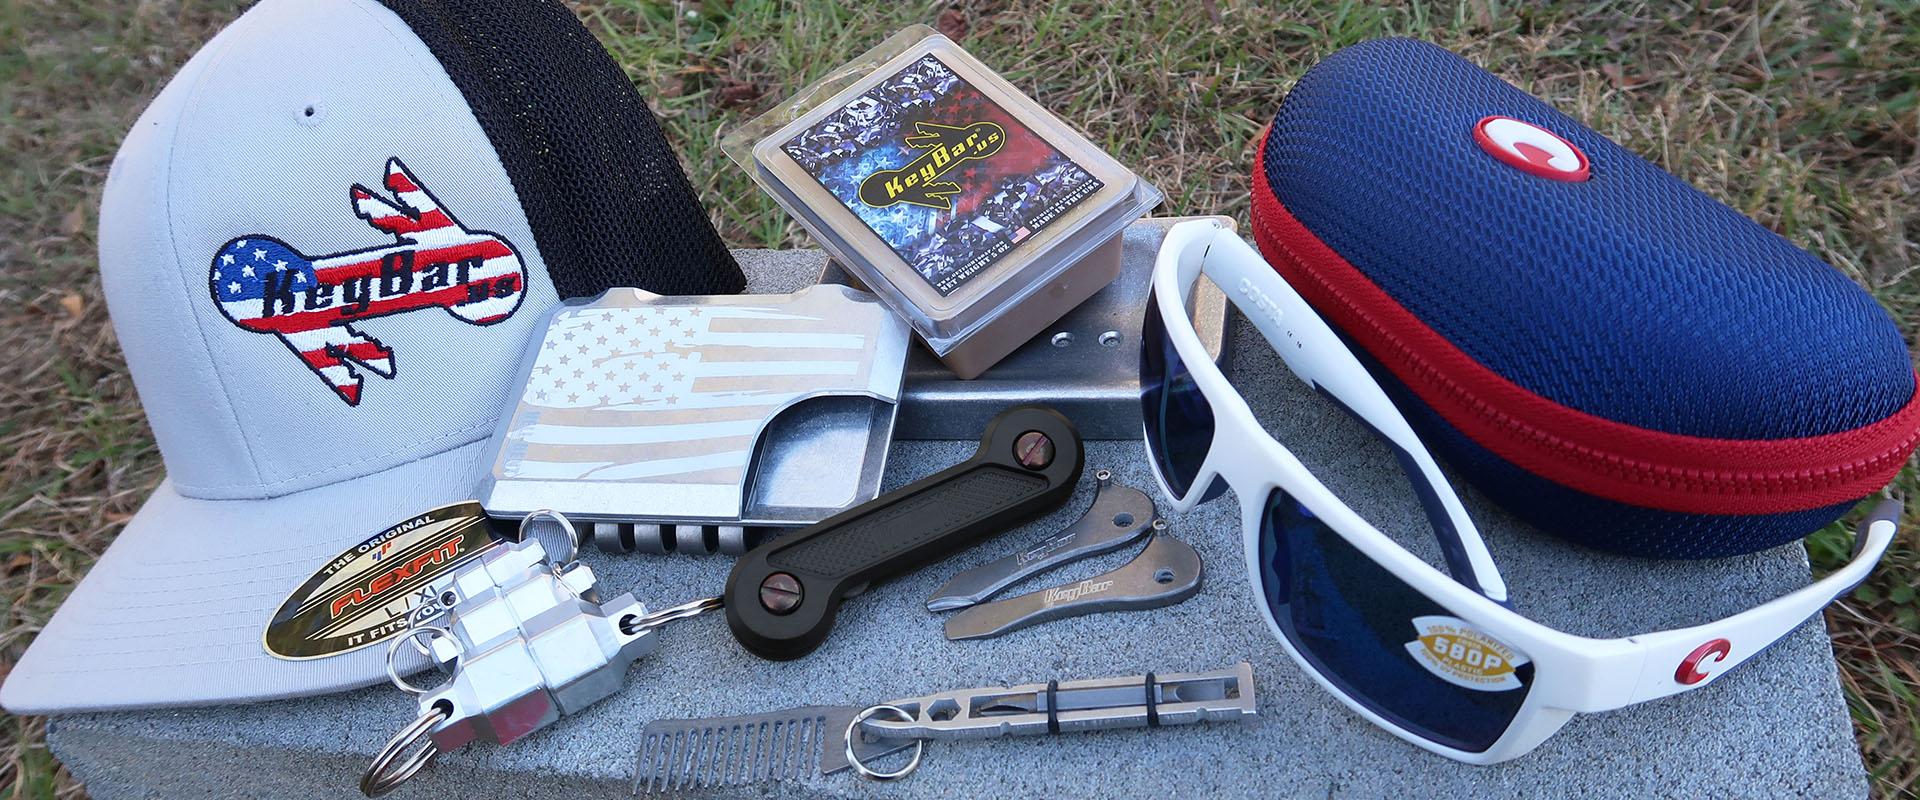 Costa Sunglasses and KeyBar Key Organizer EDC Tool Product Giveaway Image Header Image